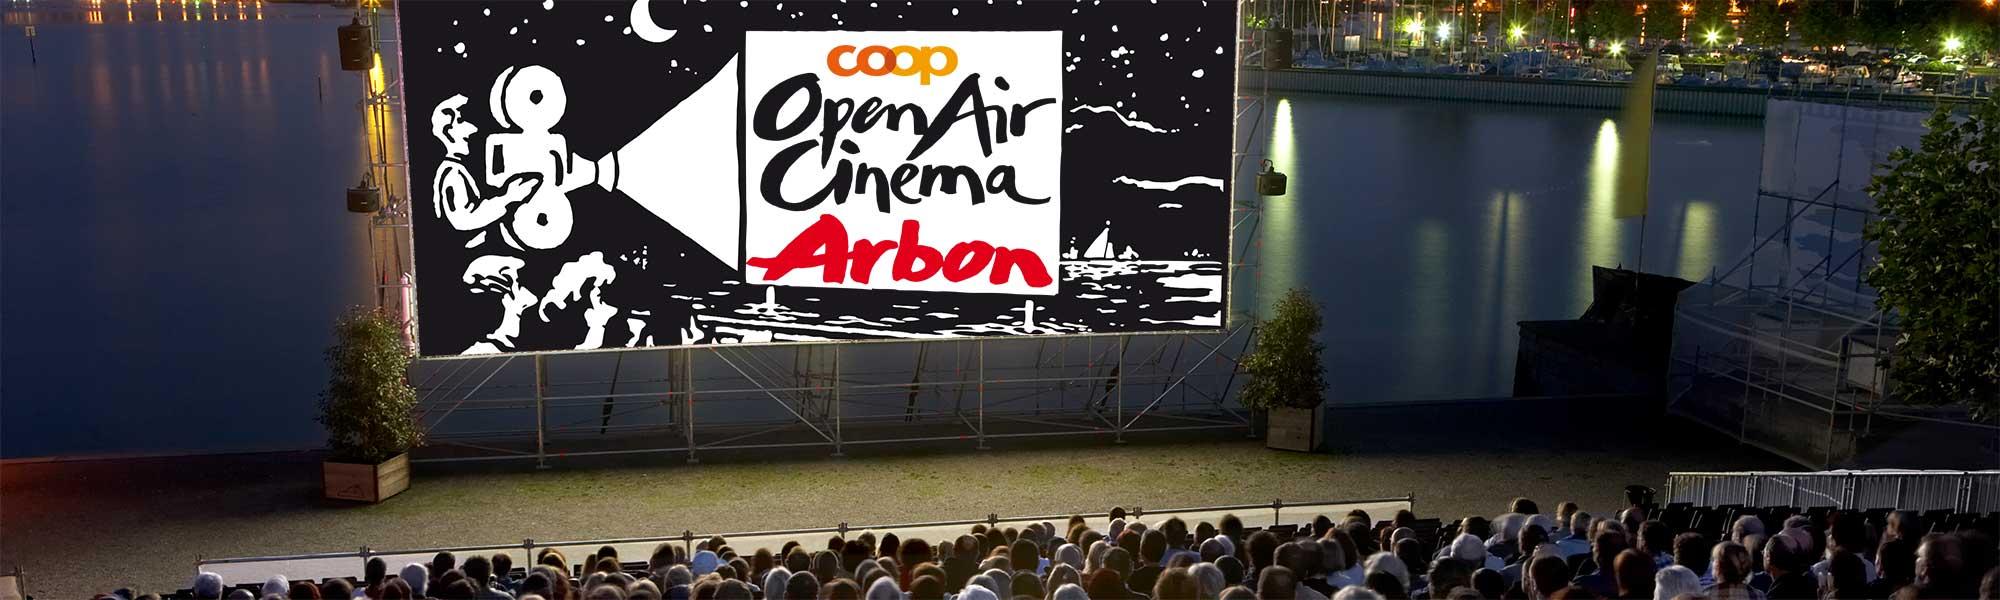 Coop Open Air Cinema Open Air Kino Arbon